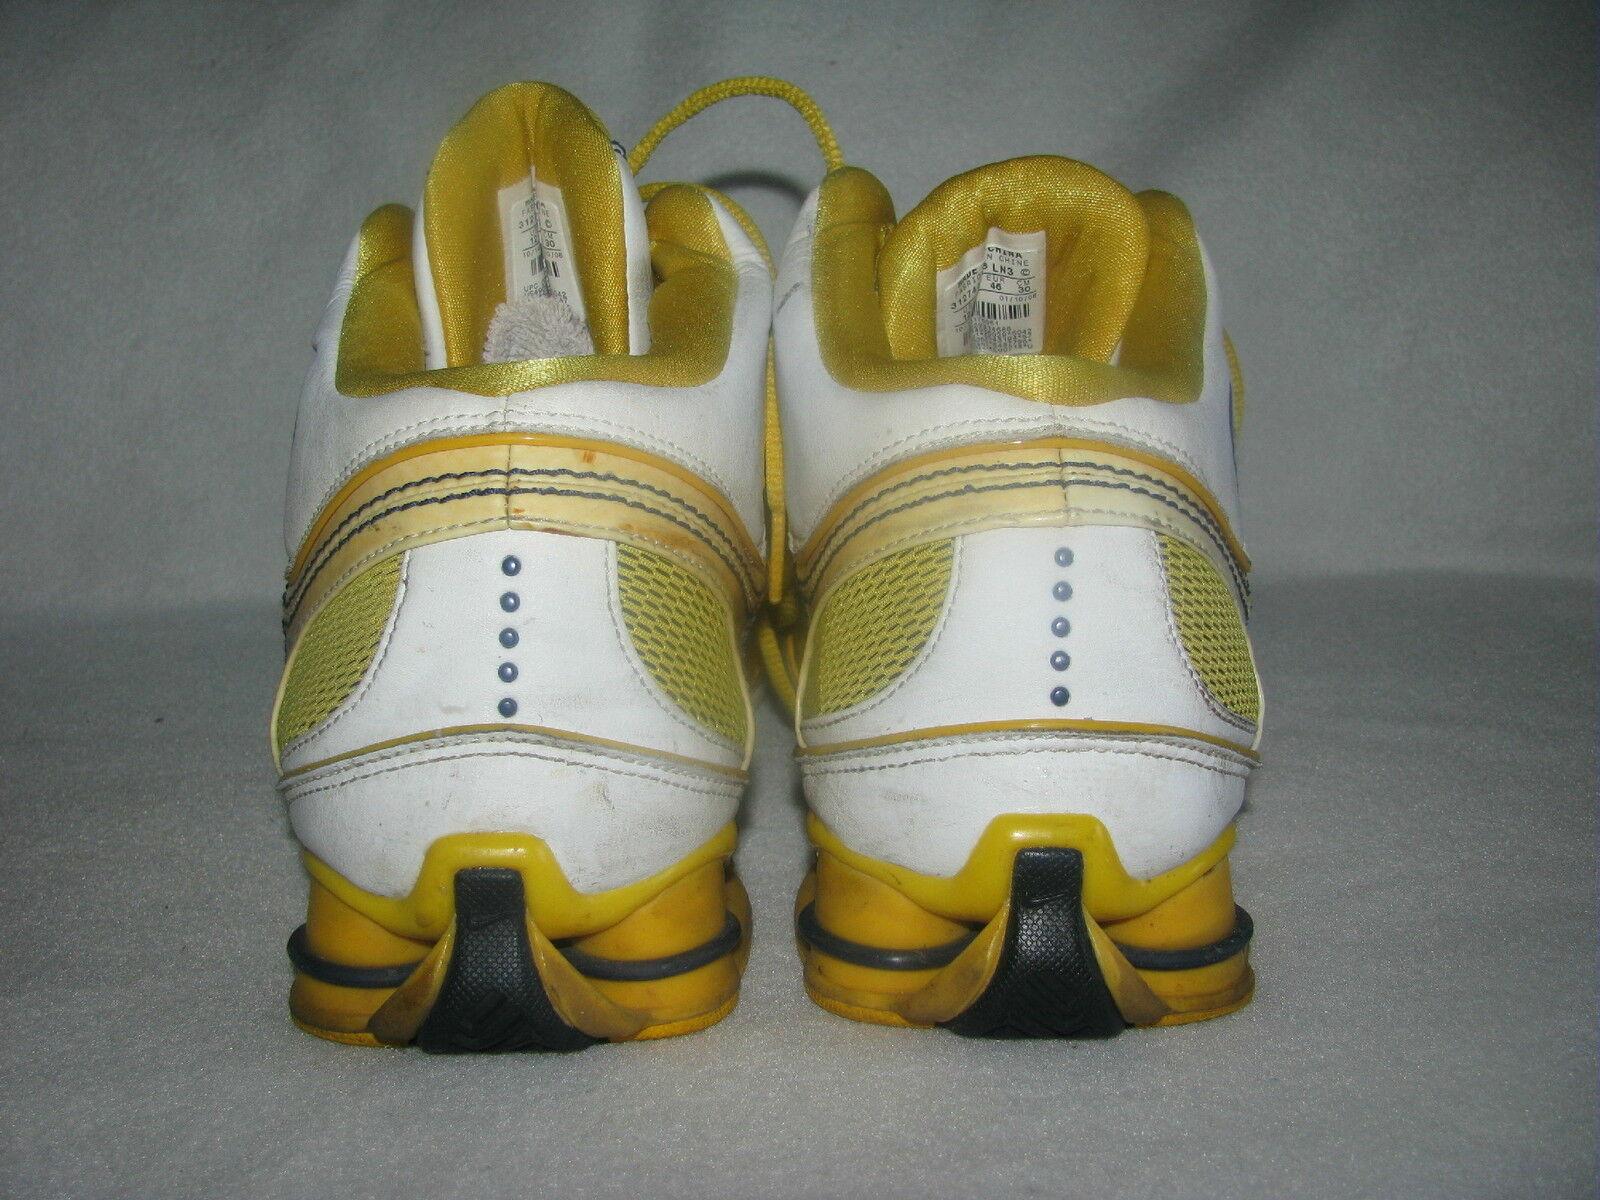 Nike air huarache huarache huarache shox männer sportschuhe sz 12 gelb / weiß 035765